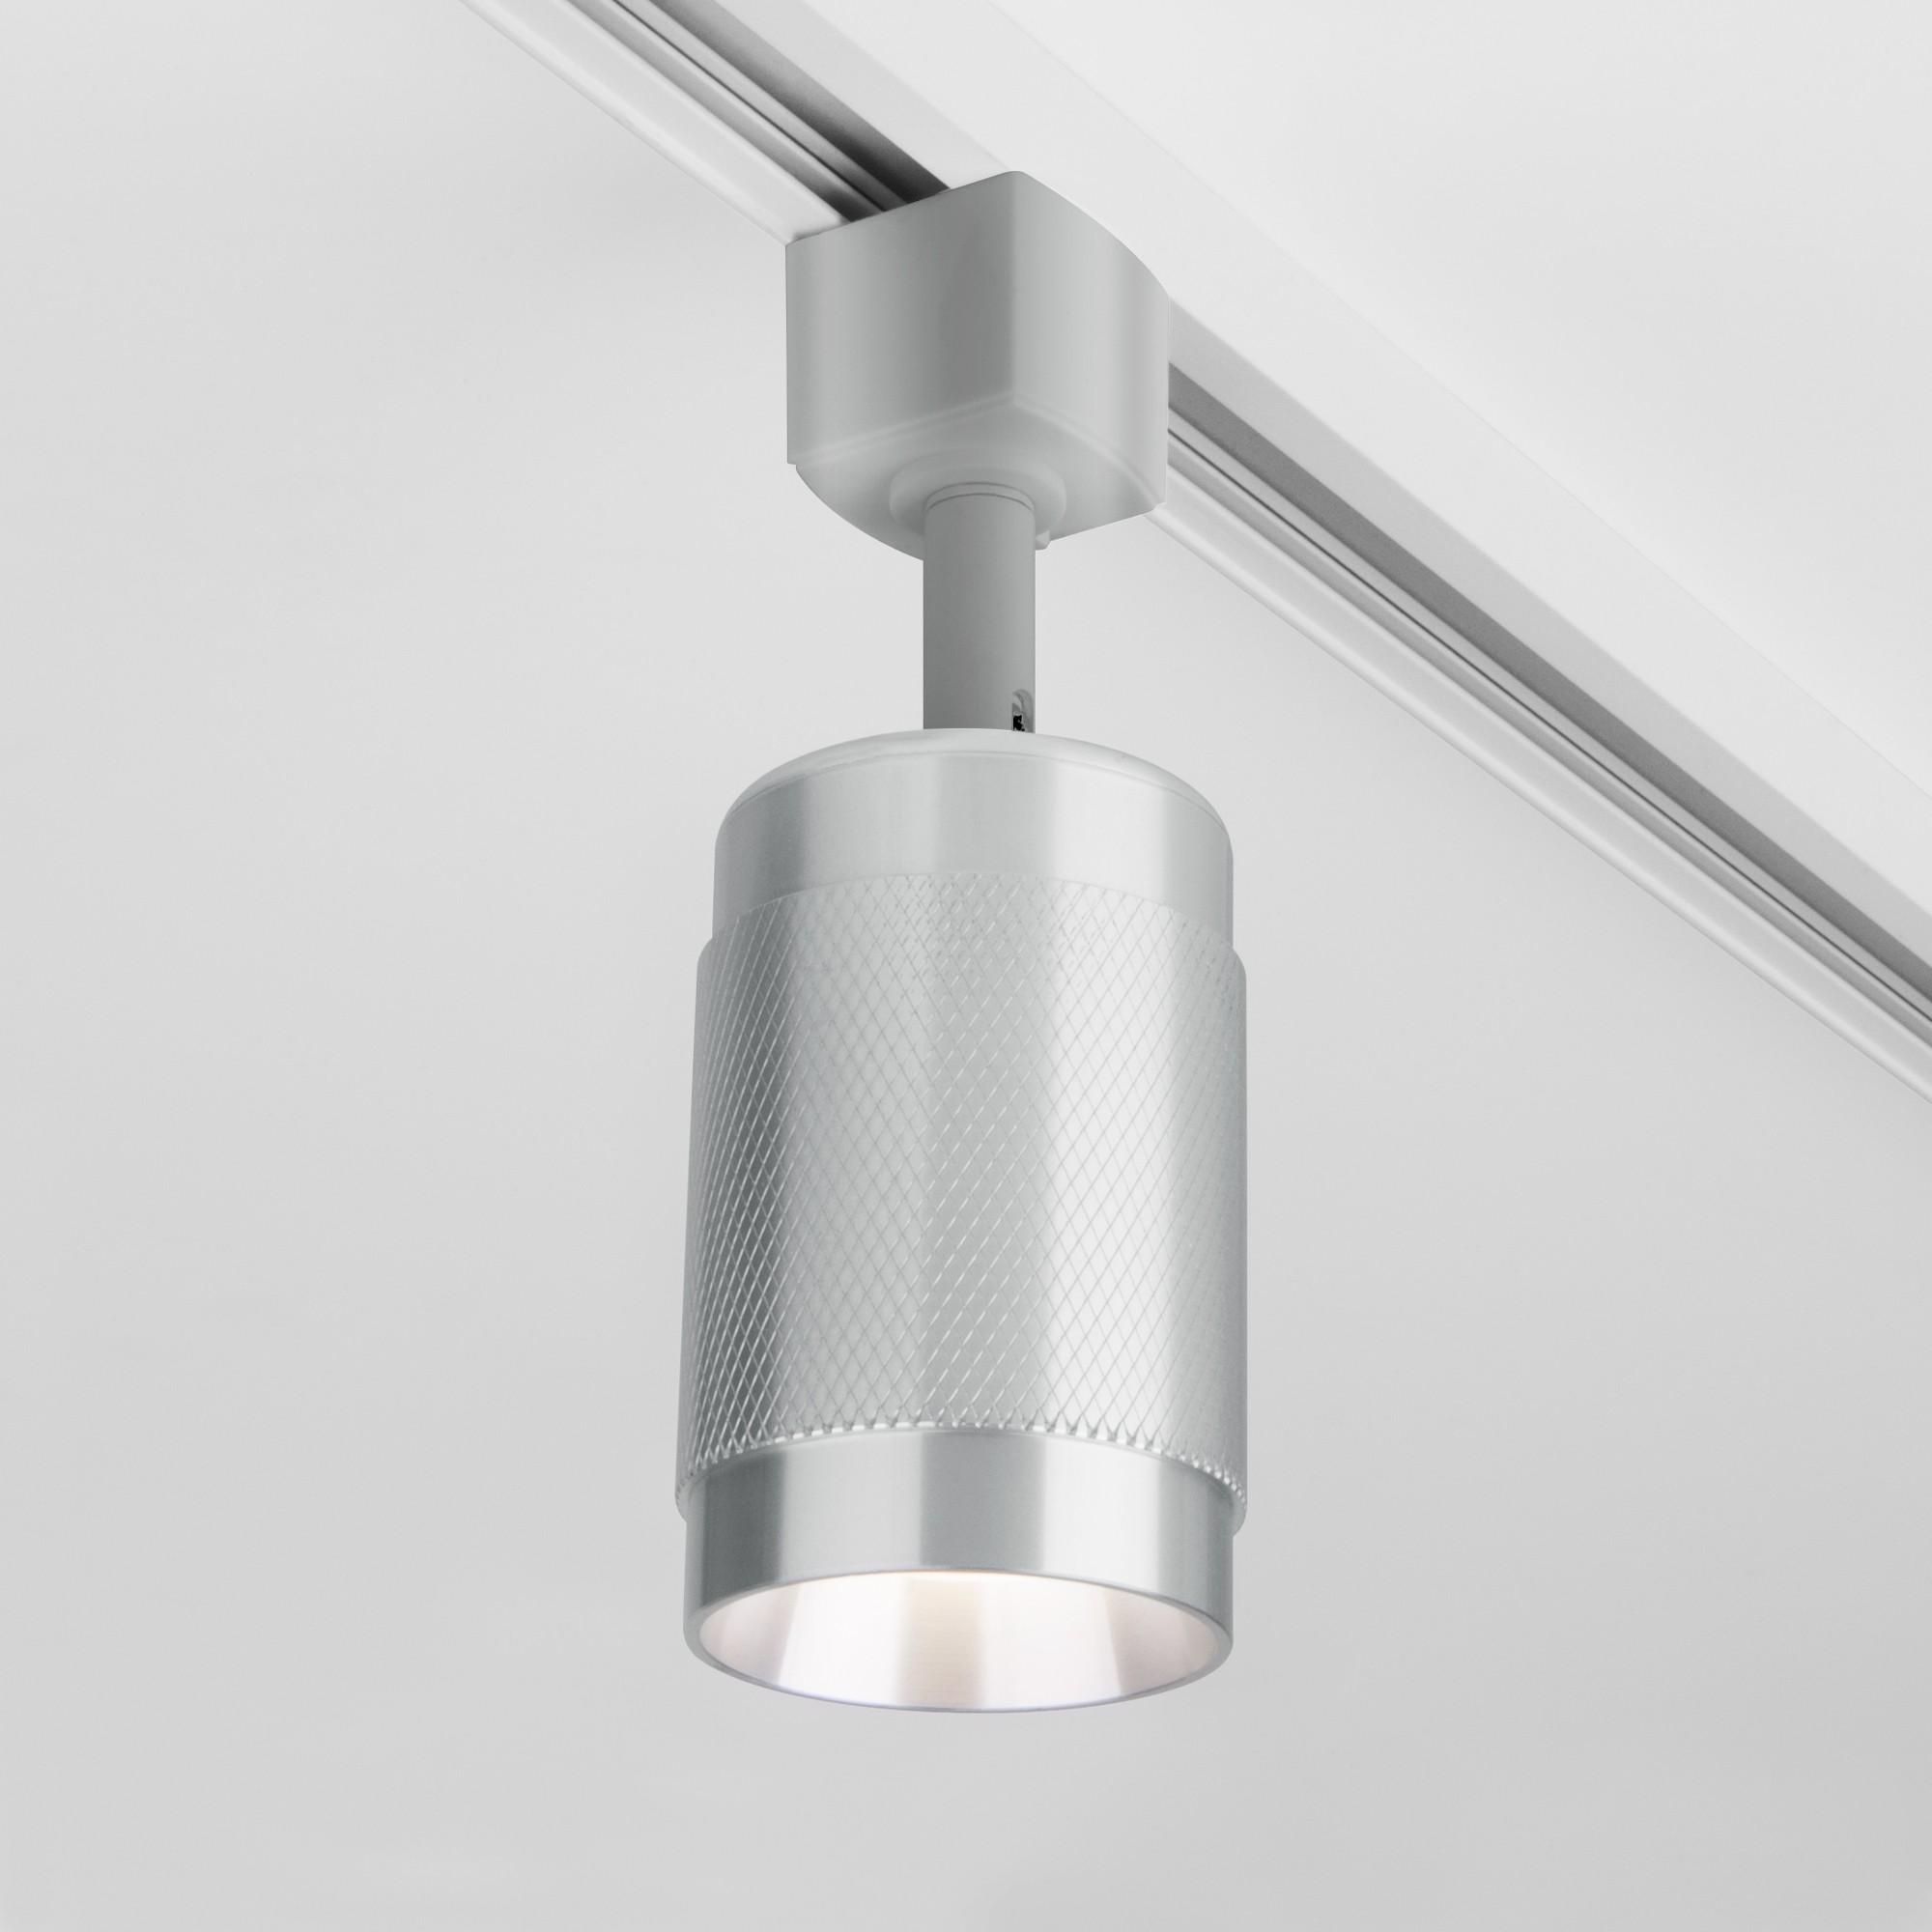 Tony GU10 Серебро (MRL 1012) однофазный